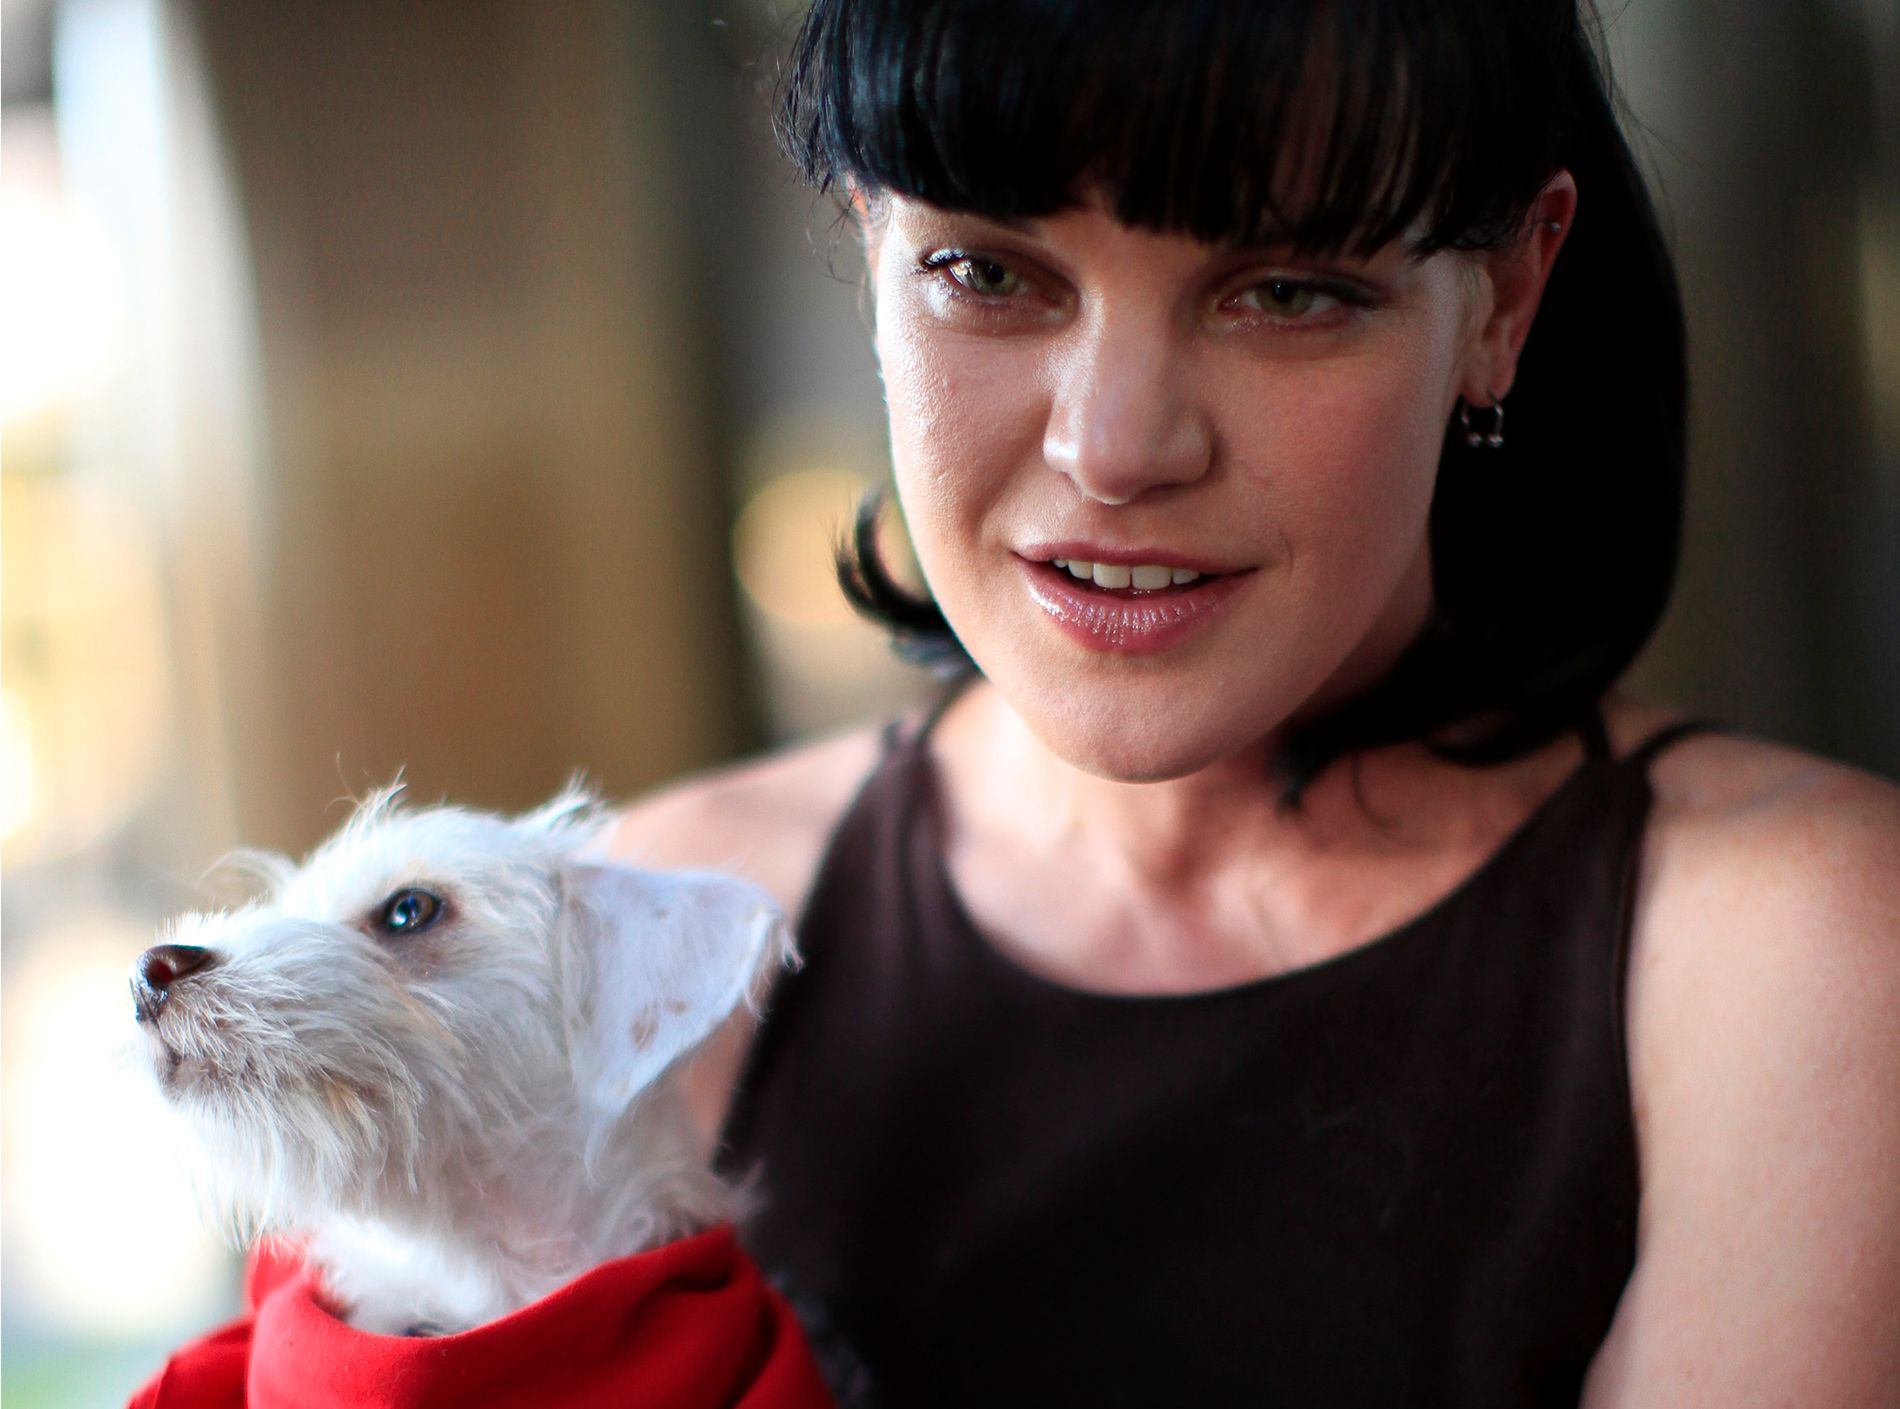 SLUTTET BRÅTT: Pauley Perrette har spilt i TV-serien «NCIS» siden 2003, men i høst offentliggjorde hun at hun slutter i serien.